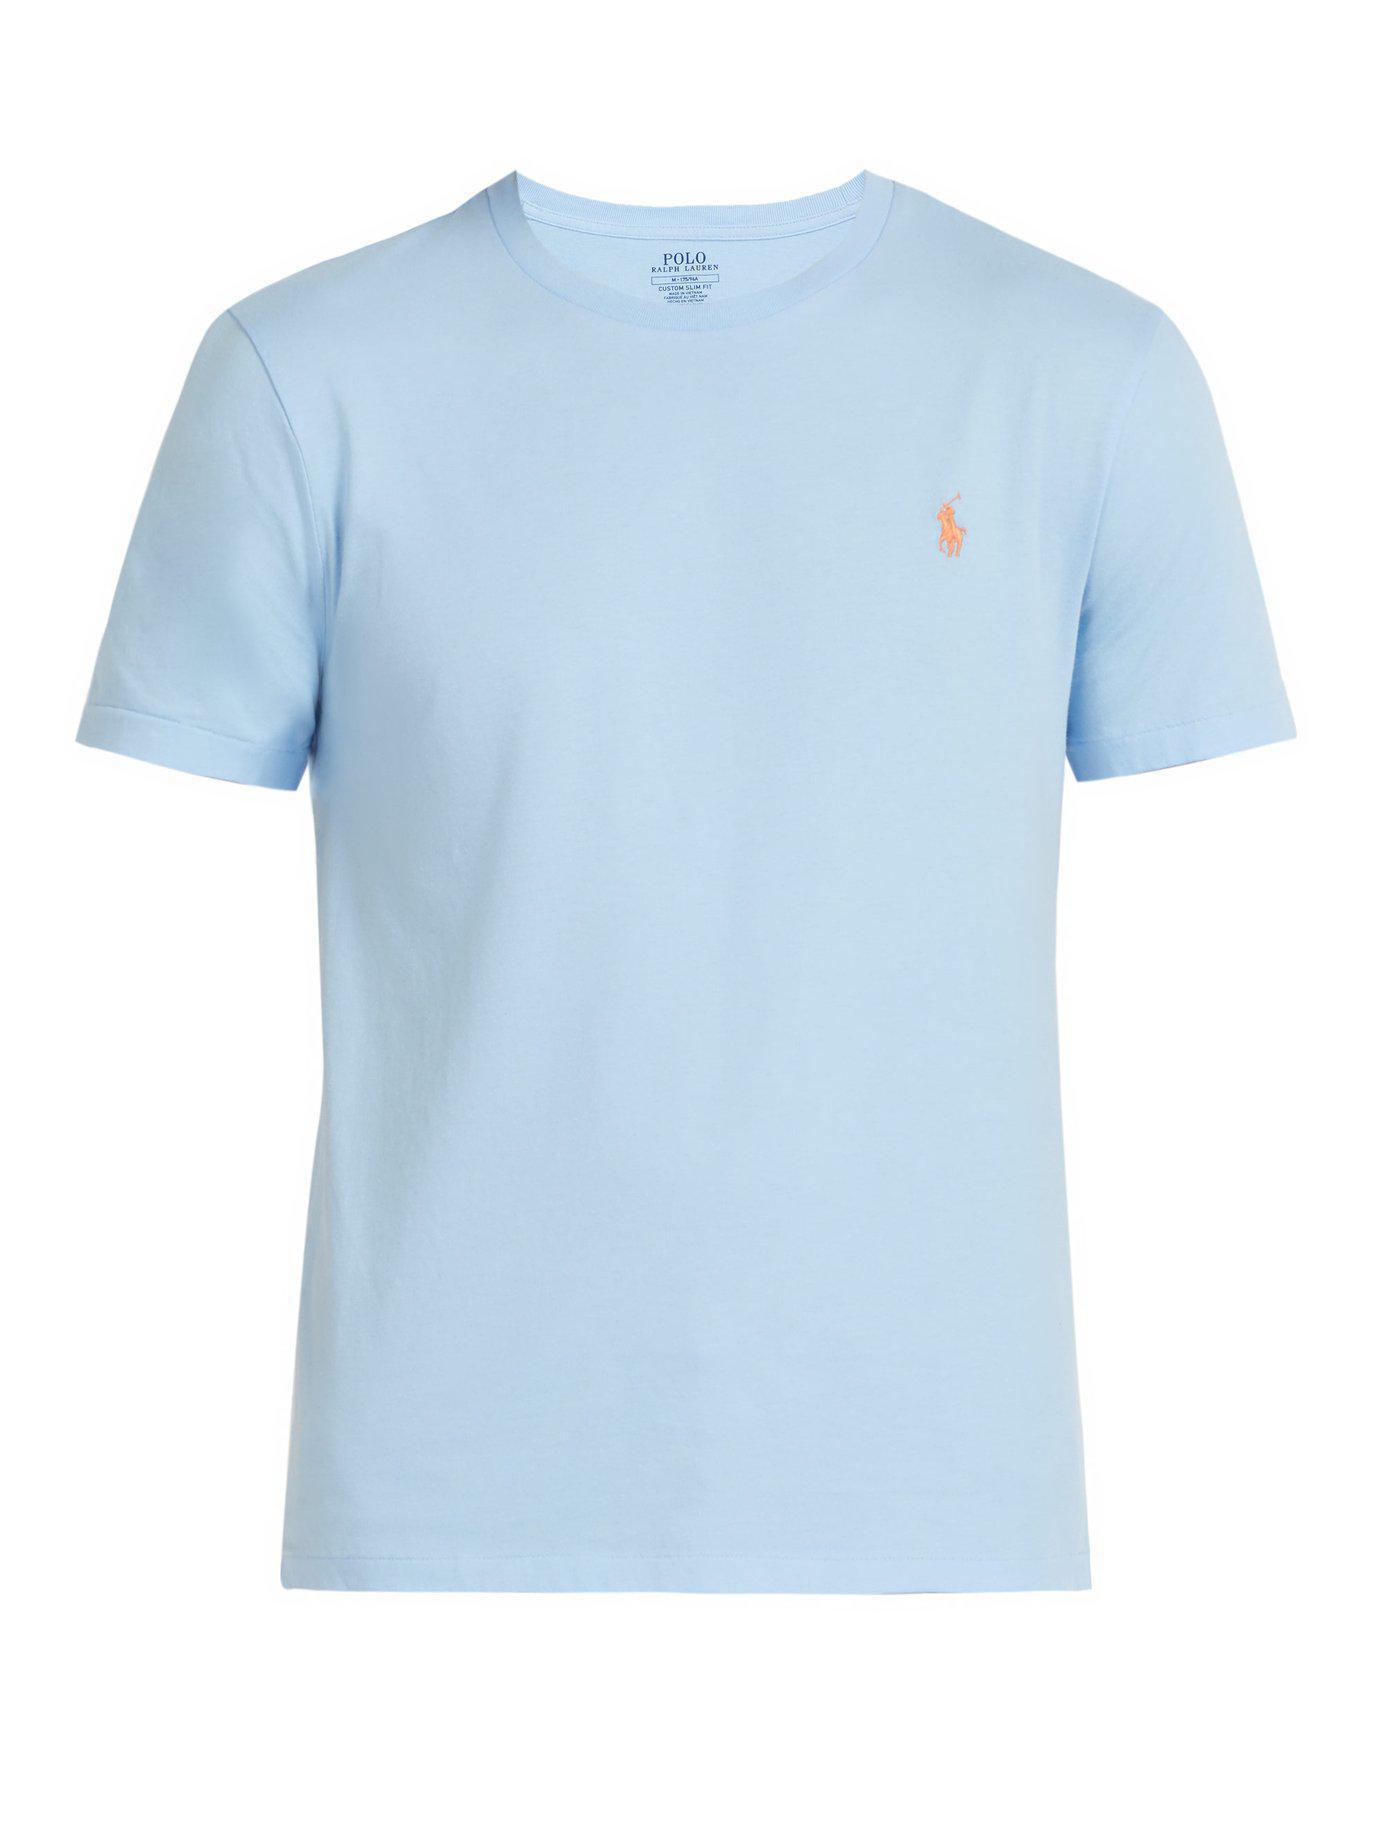 8ab43359a Polo Ralph Lauren - Blue Logo Embroidered Cotton T Shirt for Men - Lyst.  View fullscreen